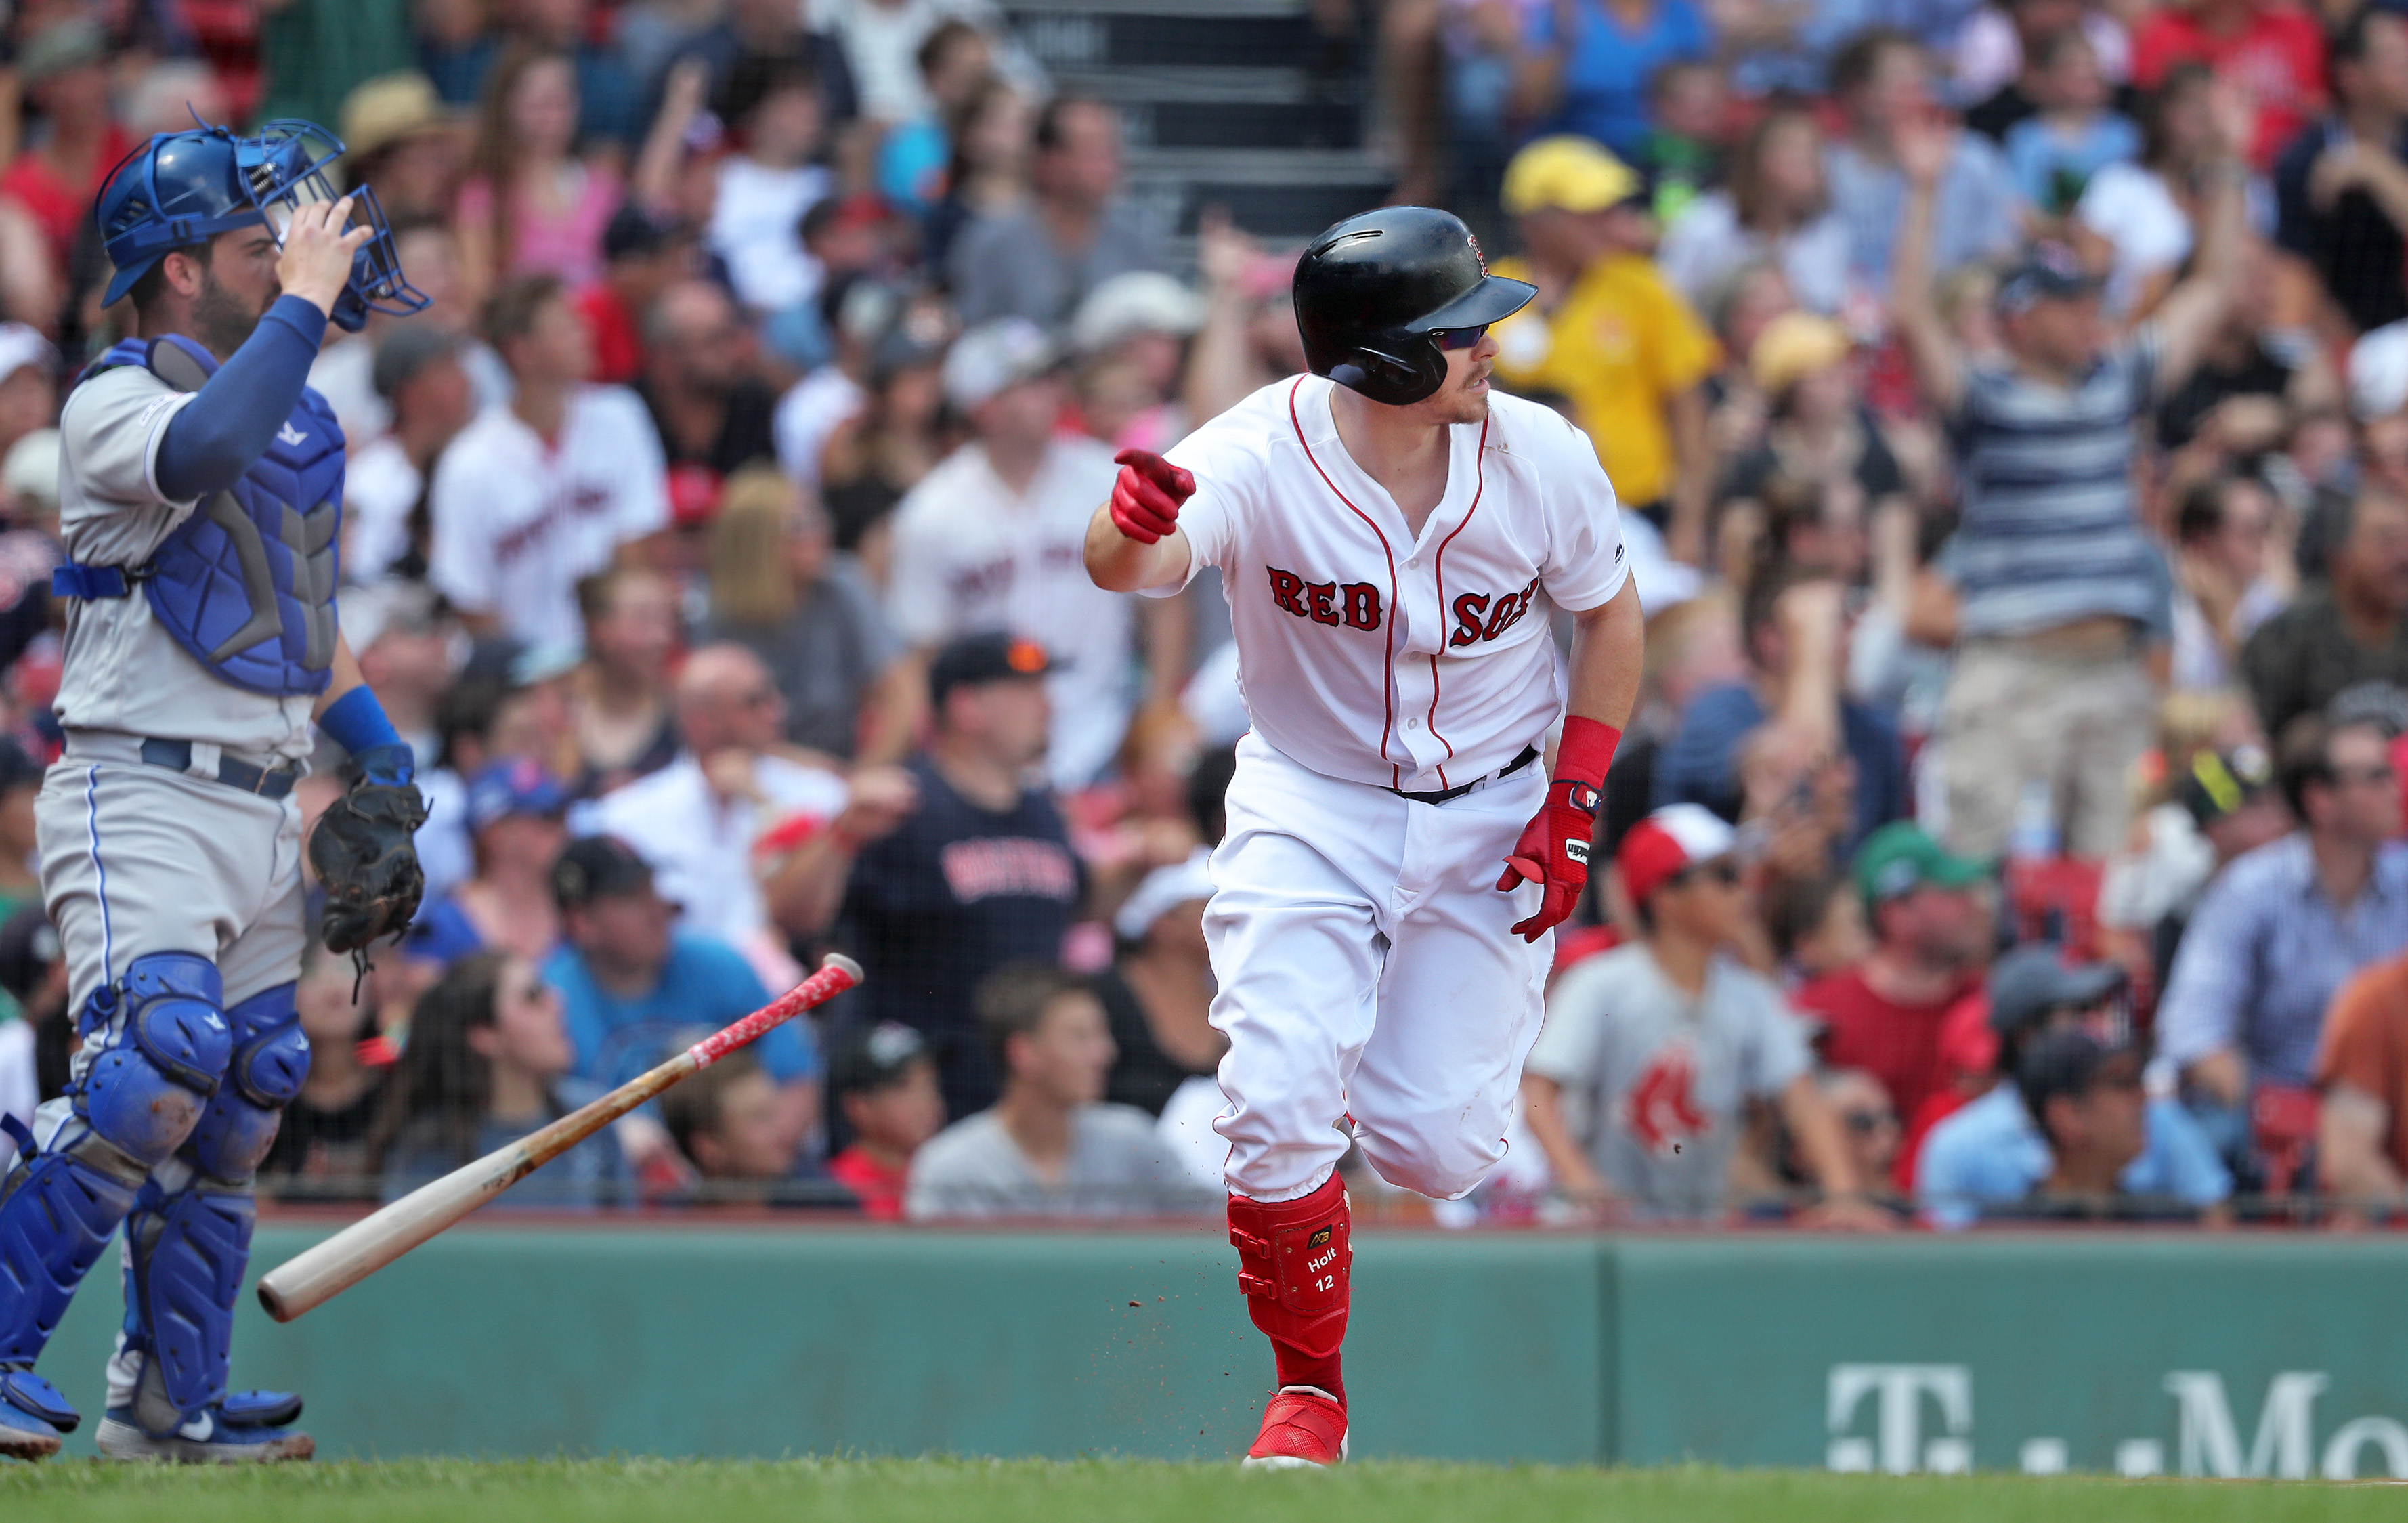 big sale 7d7f3 eef6b Facing a lefty no problem for Red Sox' Brock Holt - The ...